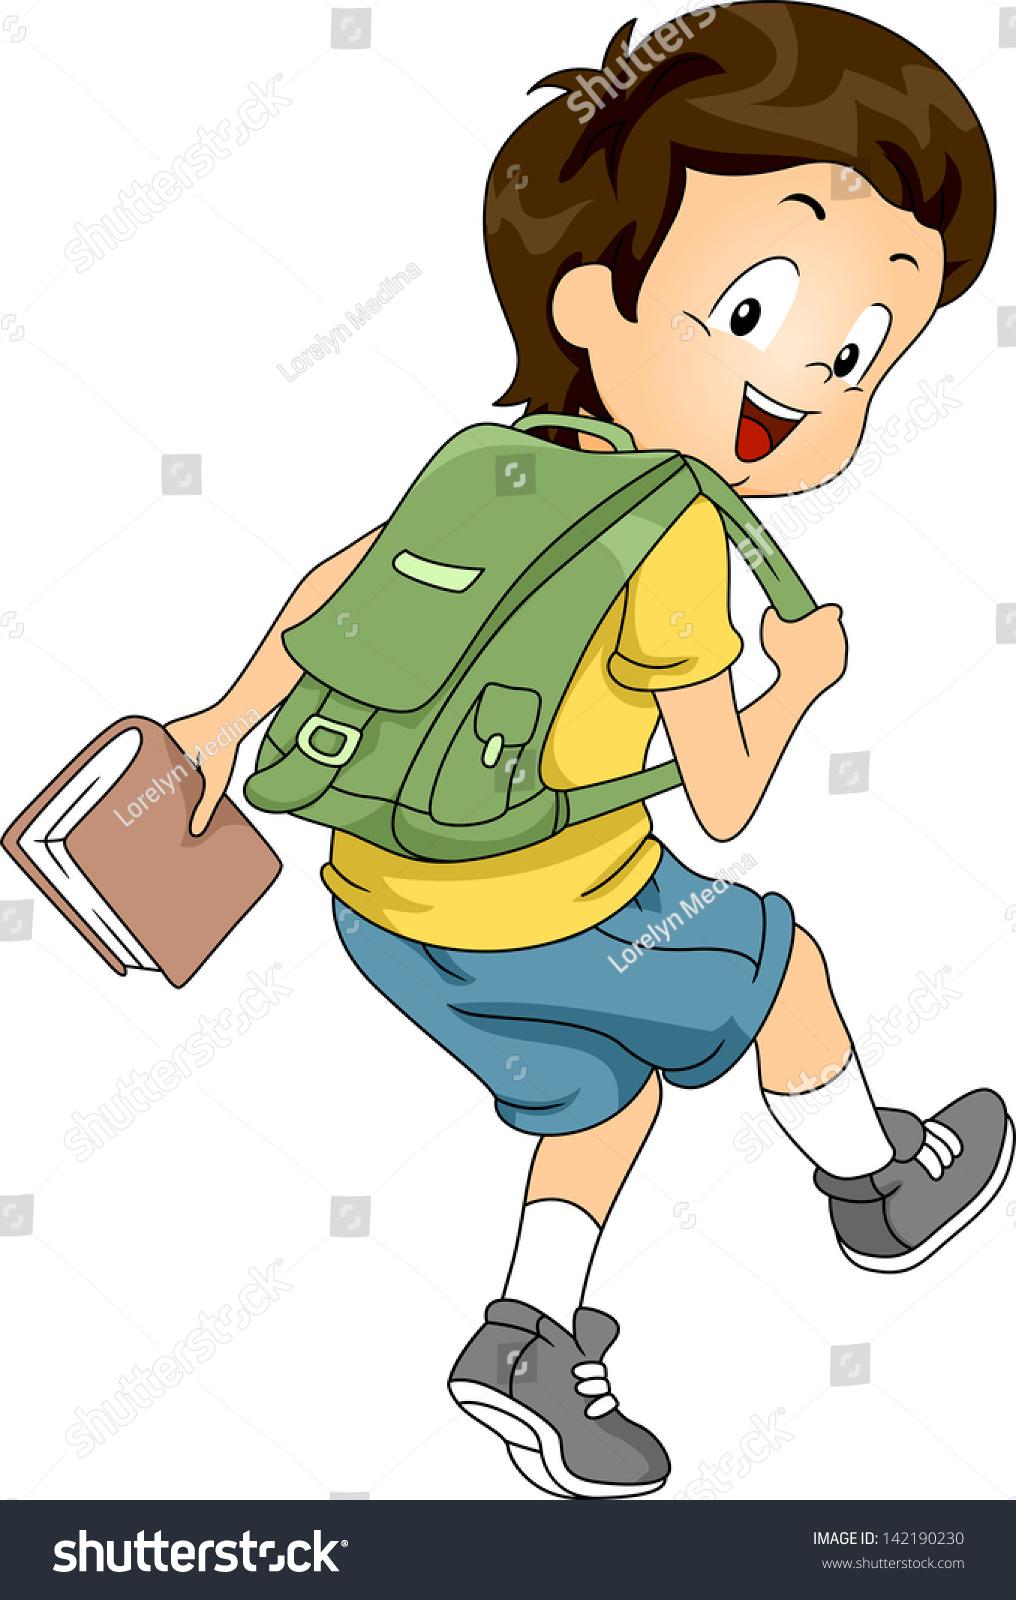 sideview illustration little kid boy student stock vector Cartoon School Backpack Teen Back to School No